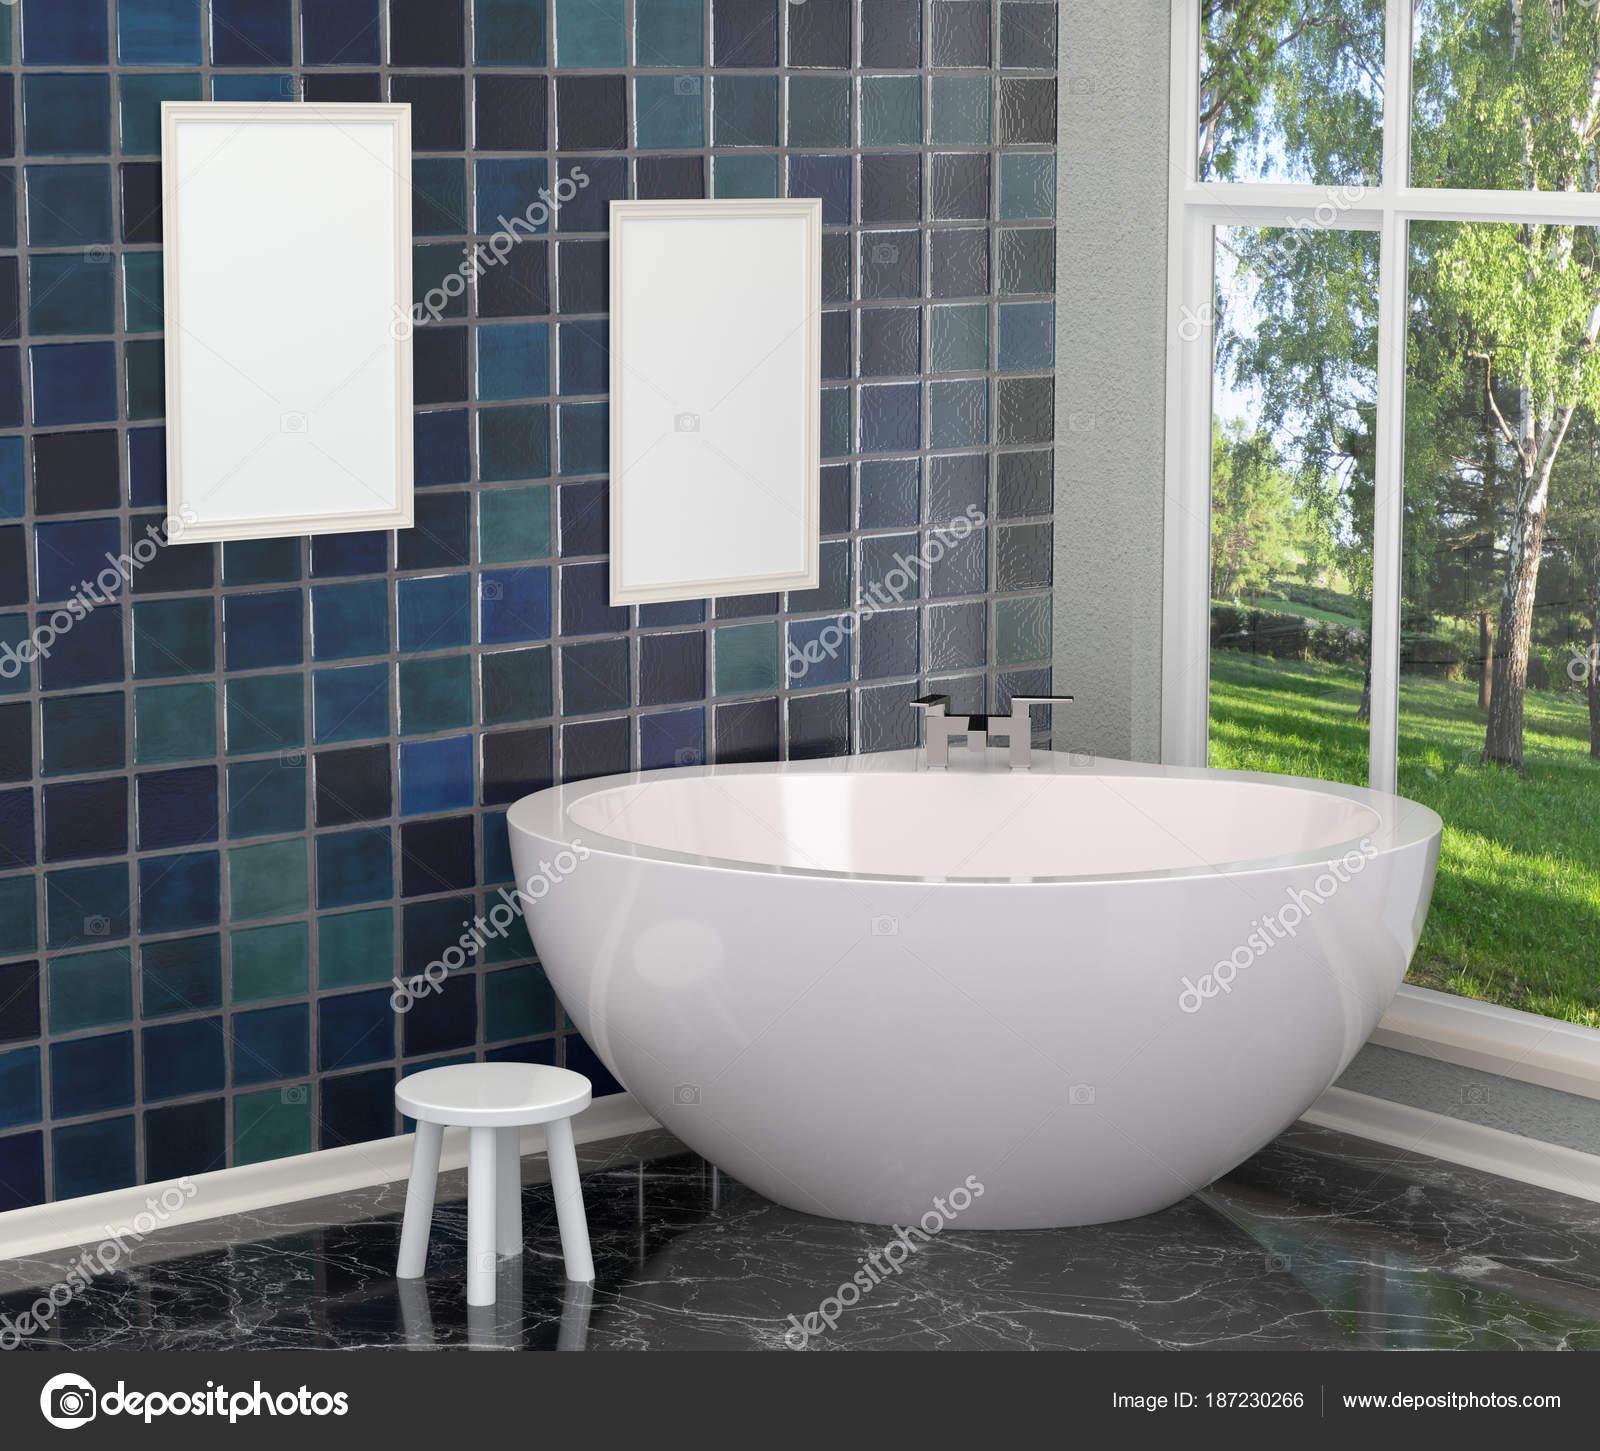 Salle De Bain Luxueuse Moderne ~ blanc moderne salle de bain luxueuse dans la salle de bain avec